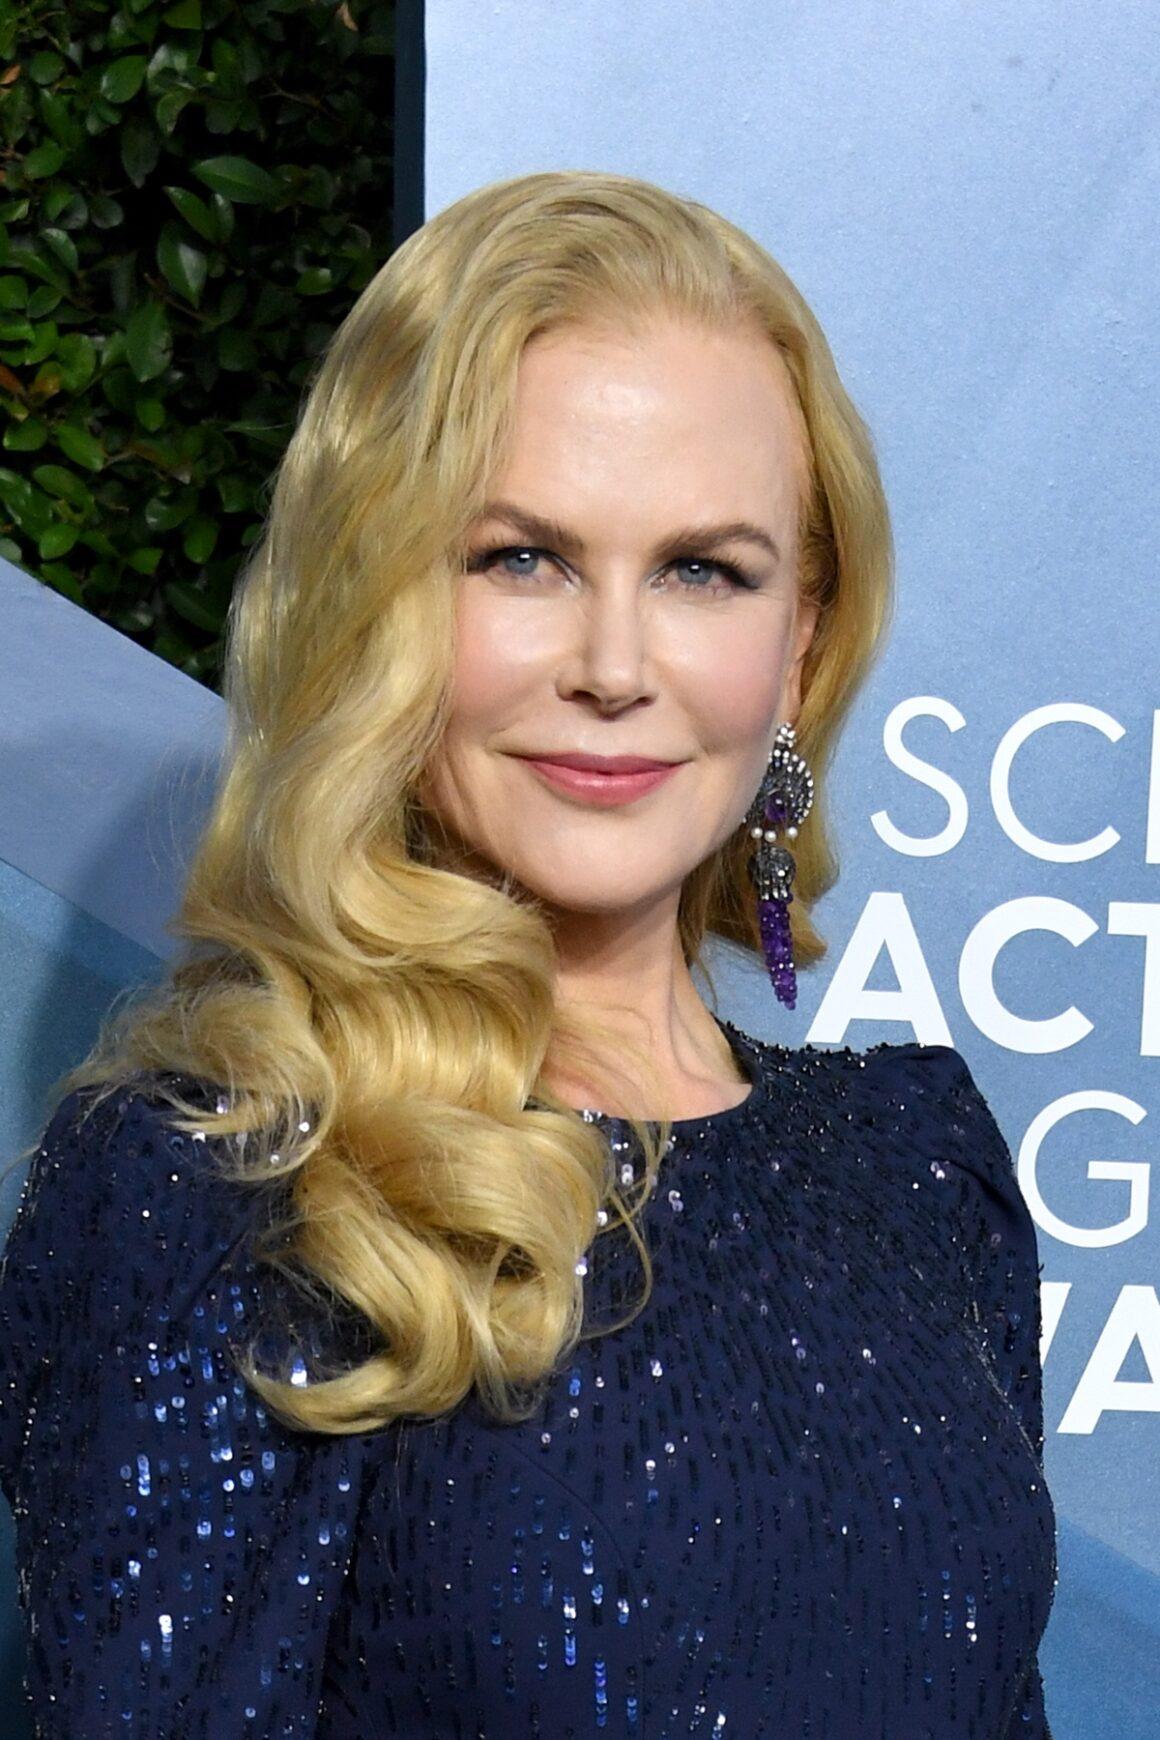 Nicole Kidman 26th Annual Screen ActorsGuild Awards - Arrivals